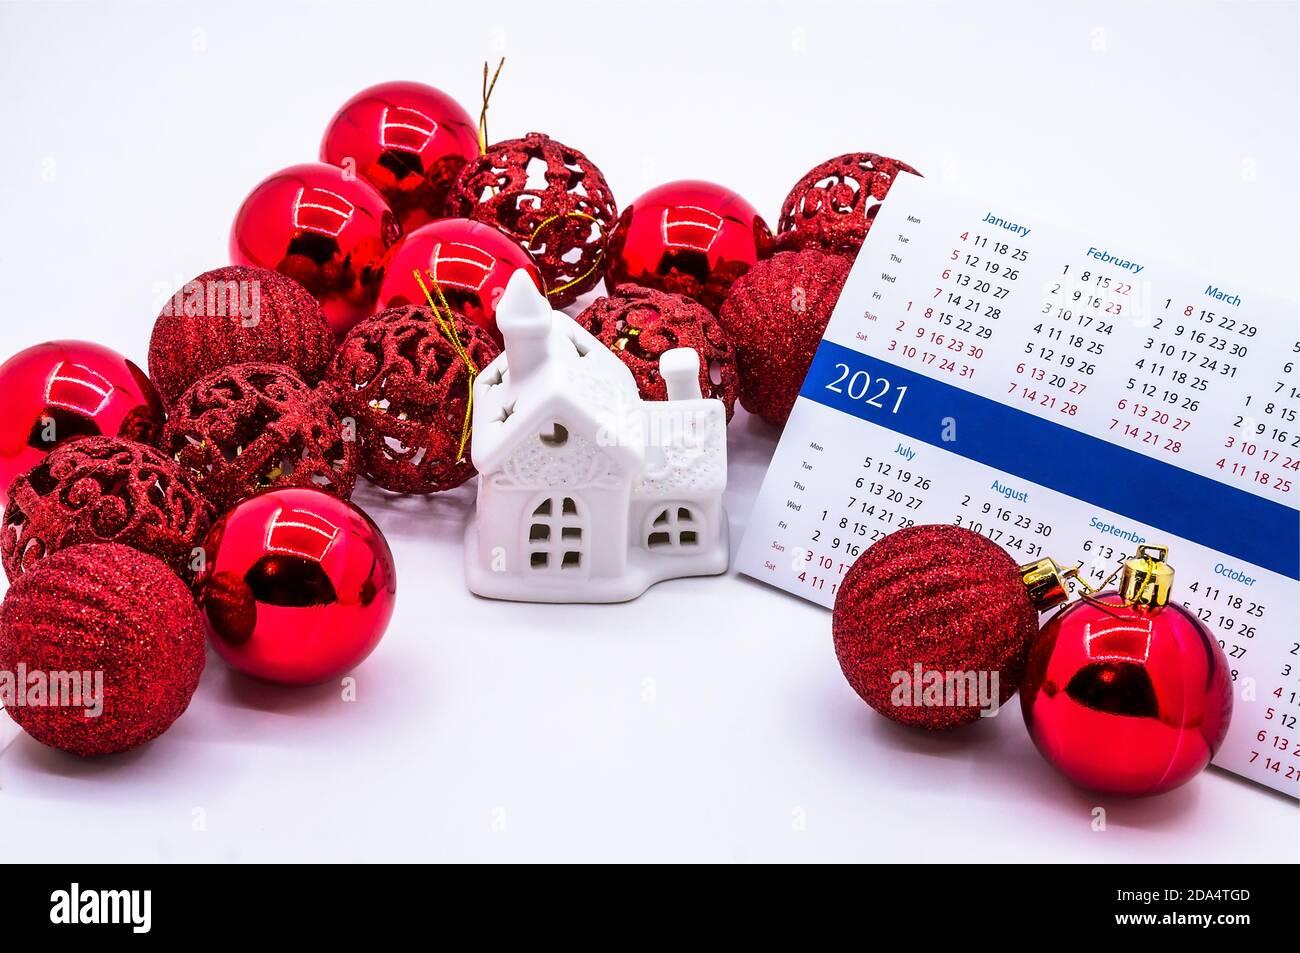 Natale 2021 Calendario.Casa Giocattolo E Calendario 2021 Palle Rosse Di Natale E Casa Calendario 2021 E Palle Di Natale Foto Stock Alamy